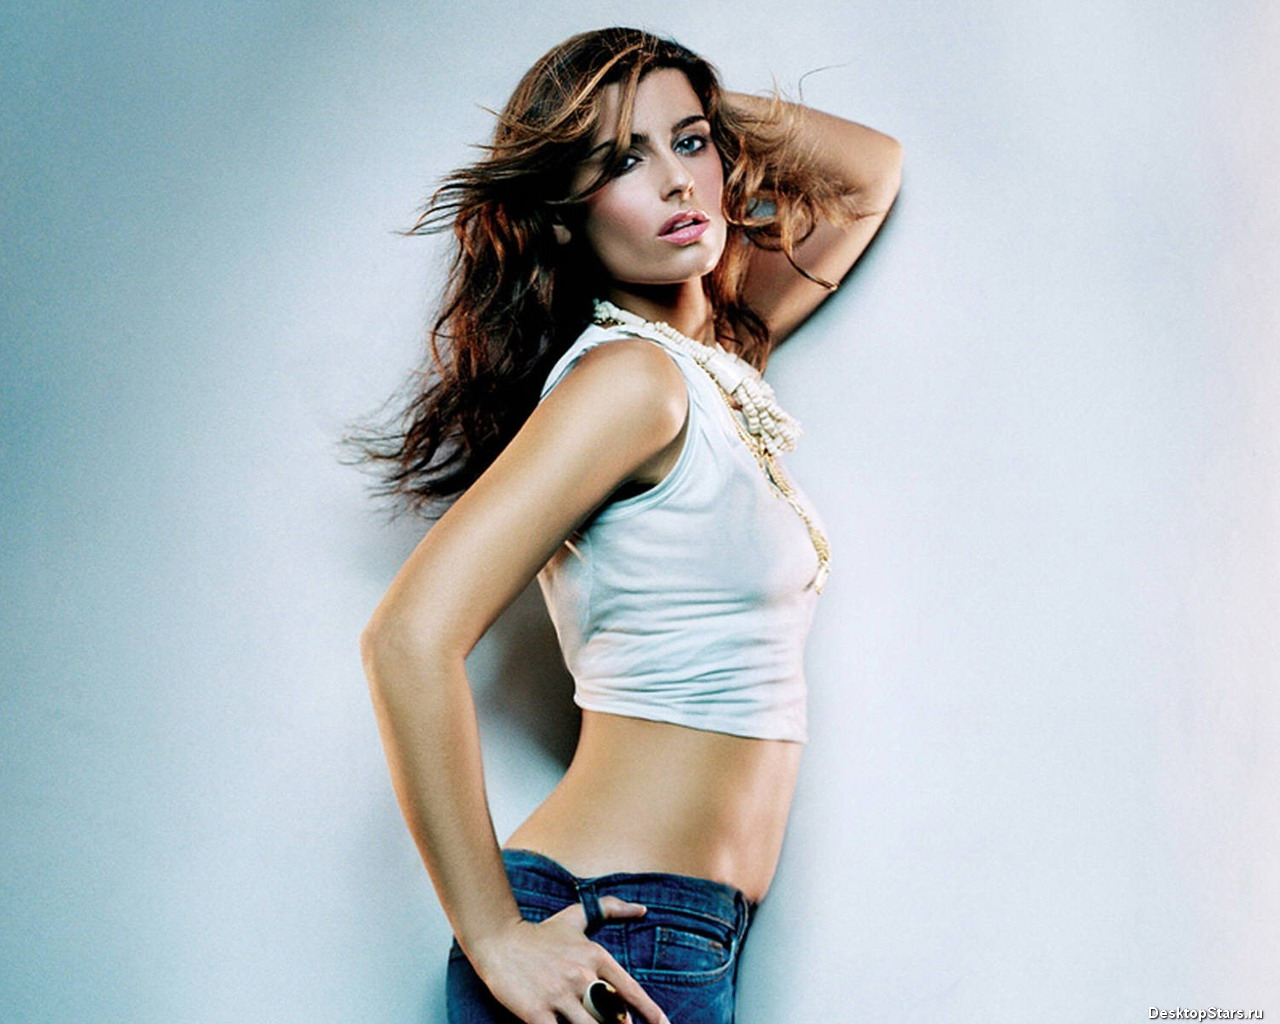 http://4.bp.blogspot.com/_BpAoKRSdVjQ/TK3eSjFex2I/AAAAAAAAB20/nbHM97DiPrM/s1600/Nelly-Furtado-celebrity.jpg